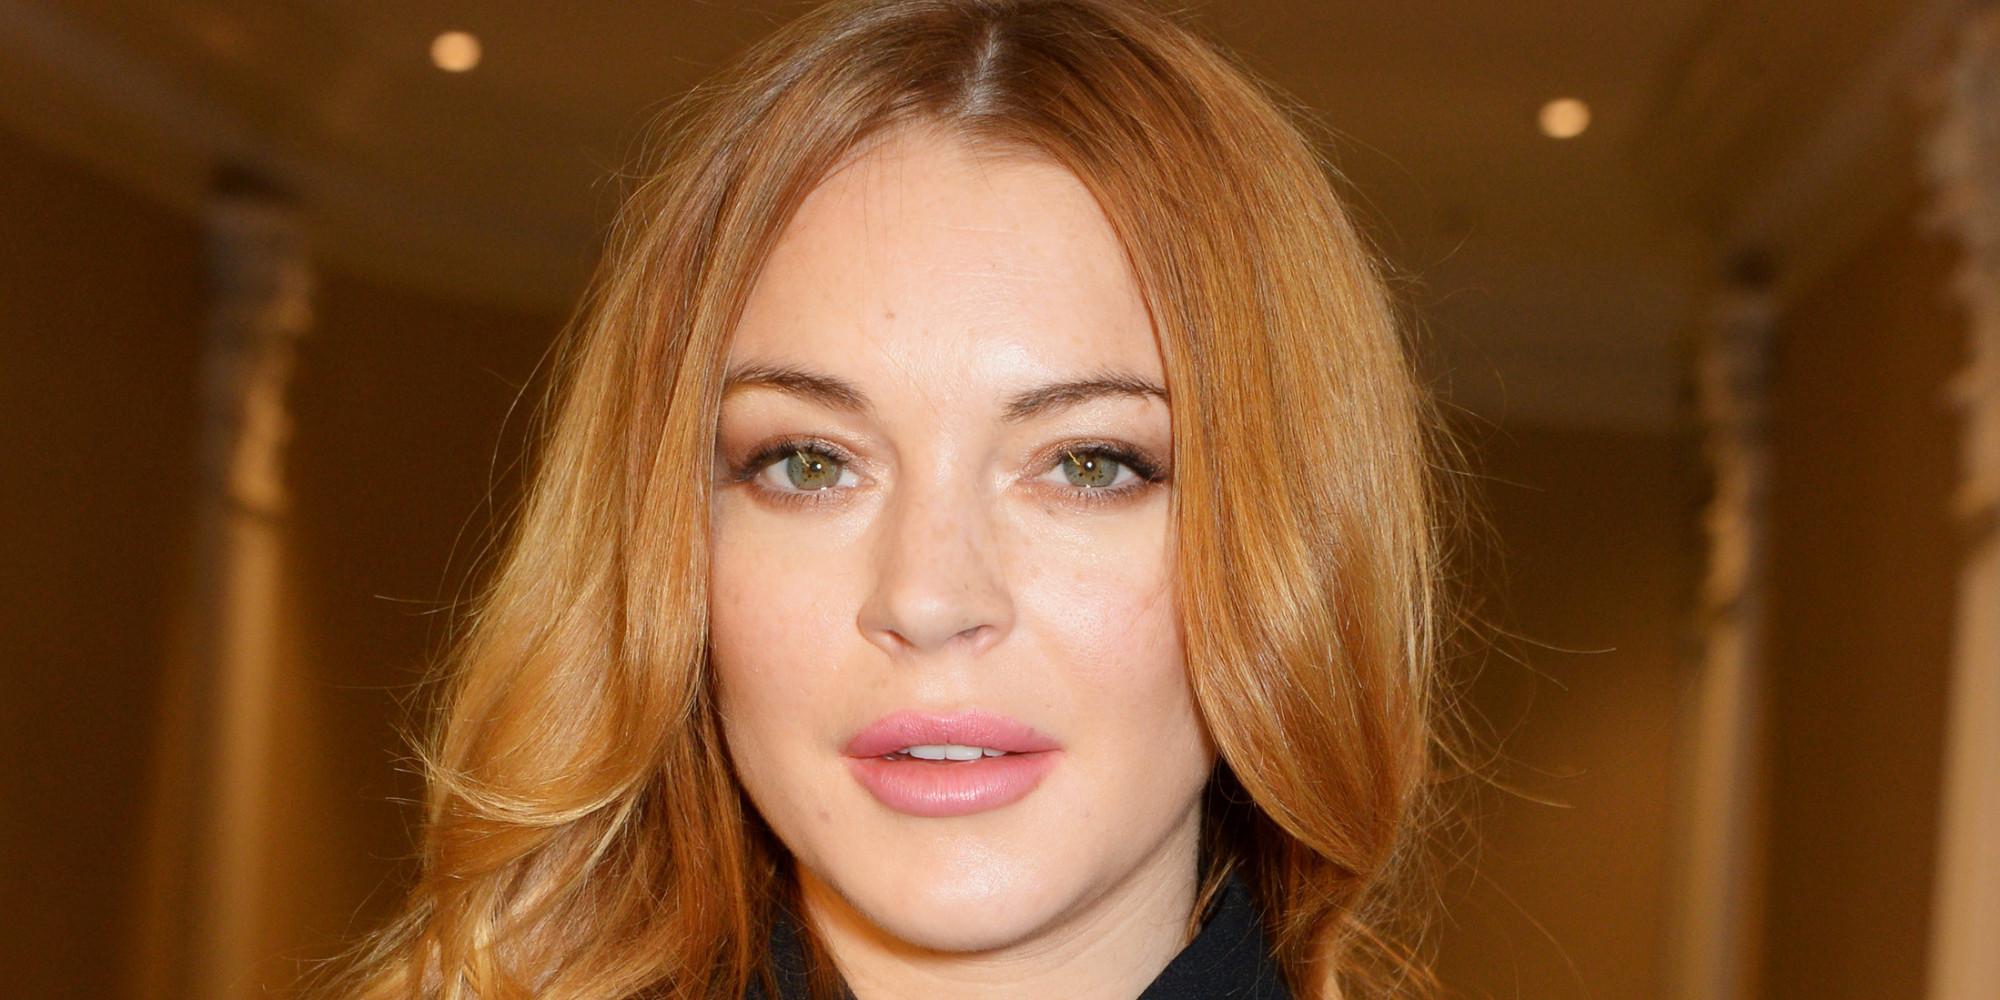 Lindsay Lohan Snaps A Topless Selfie In Her Dressing Room -6583